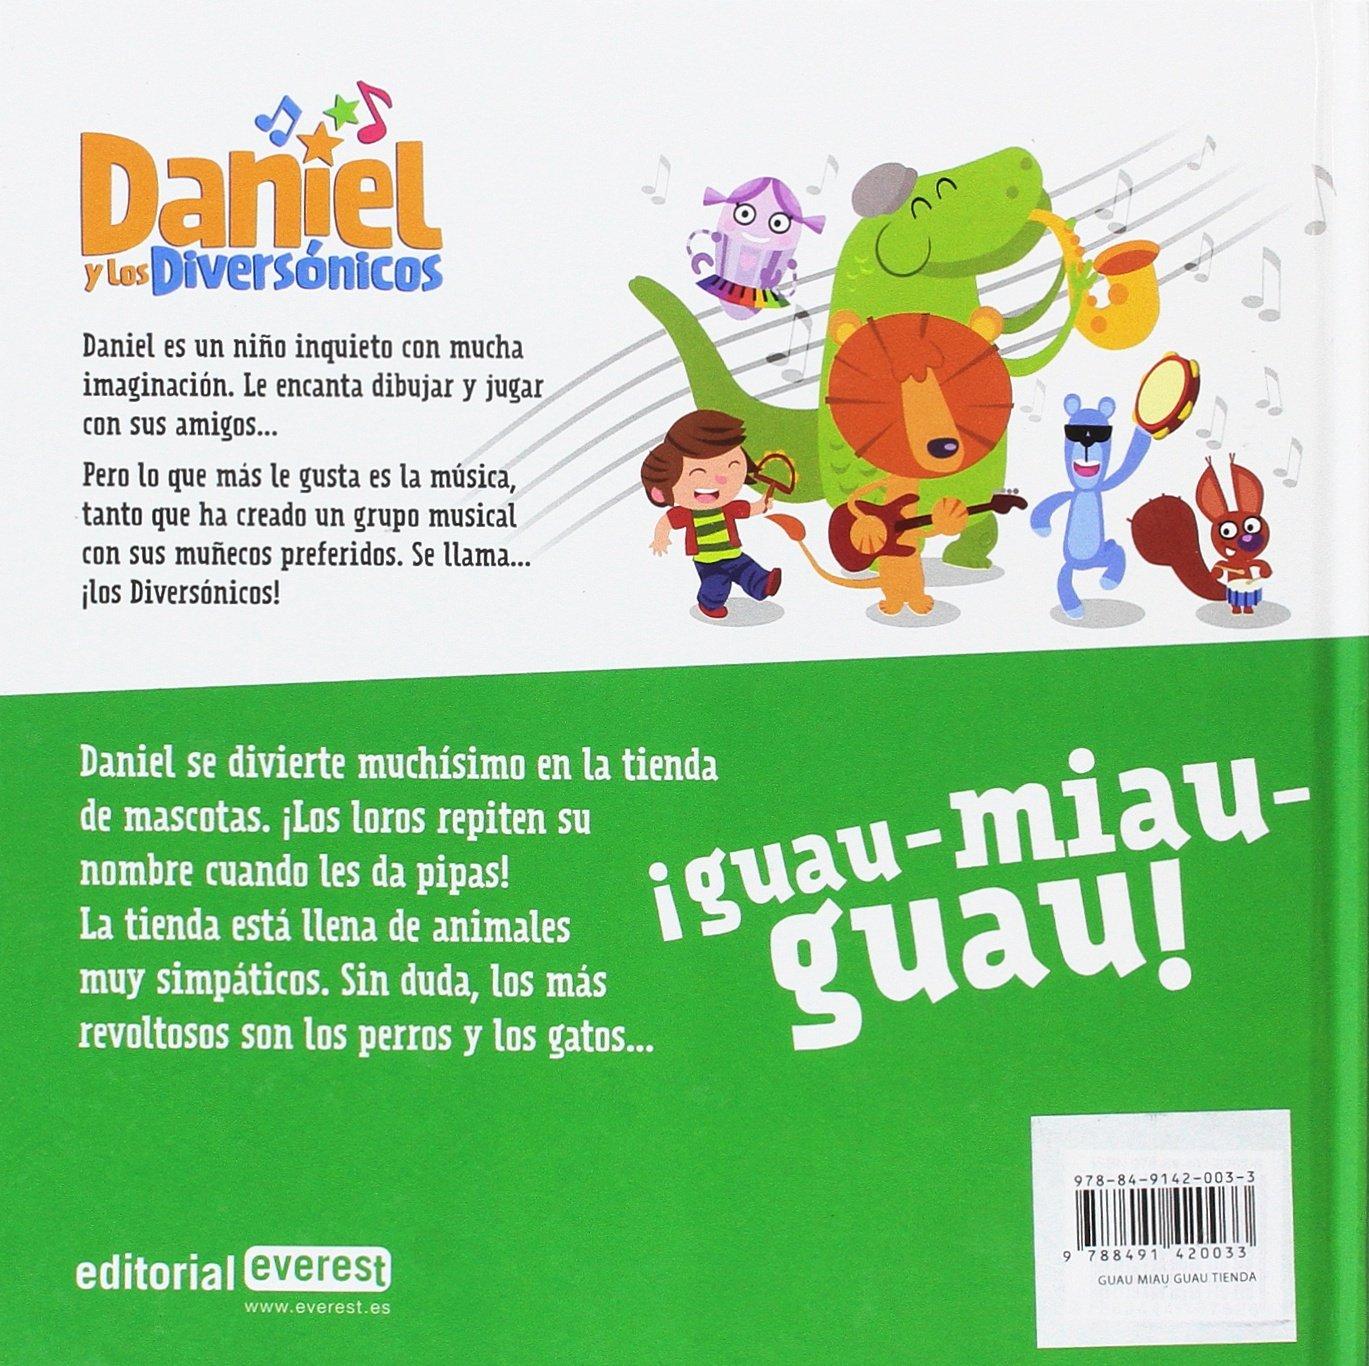 GUAU MIAU GUAU TIENDA DE ANIMALES LECTURA: AA.VV.: 9788491420033: Amazon.com: Books